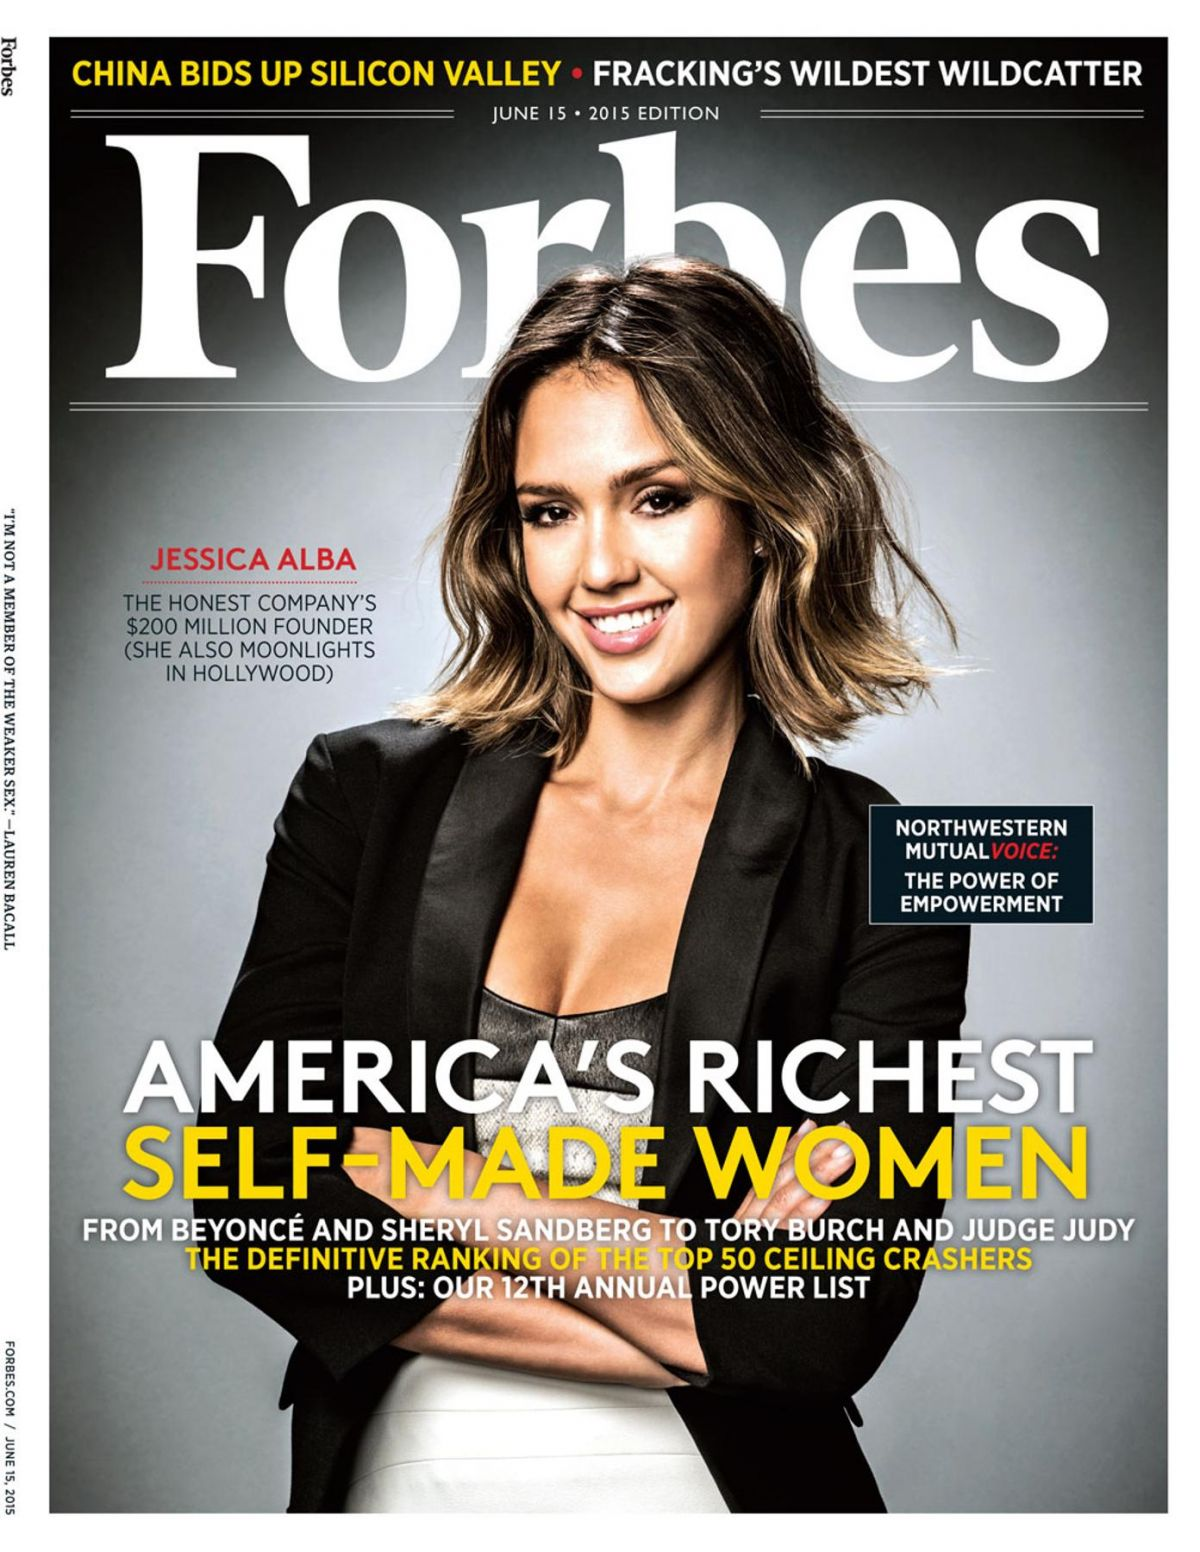 JESSICA ALBA in Forbes Magazine, June 2015 Issue